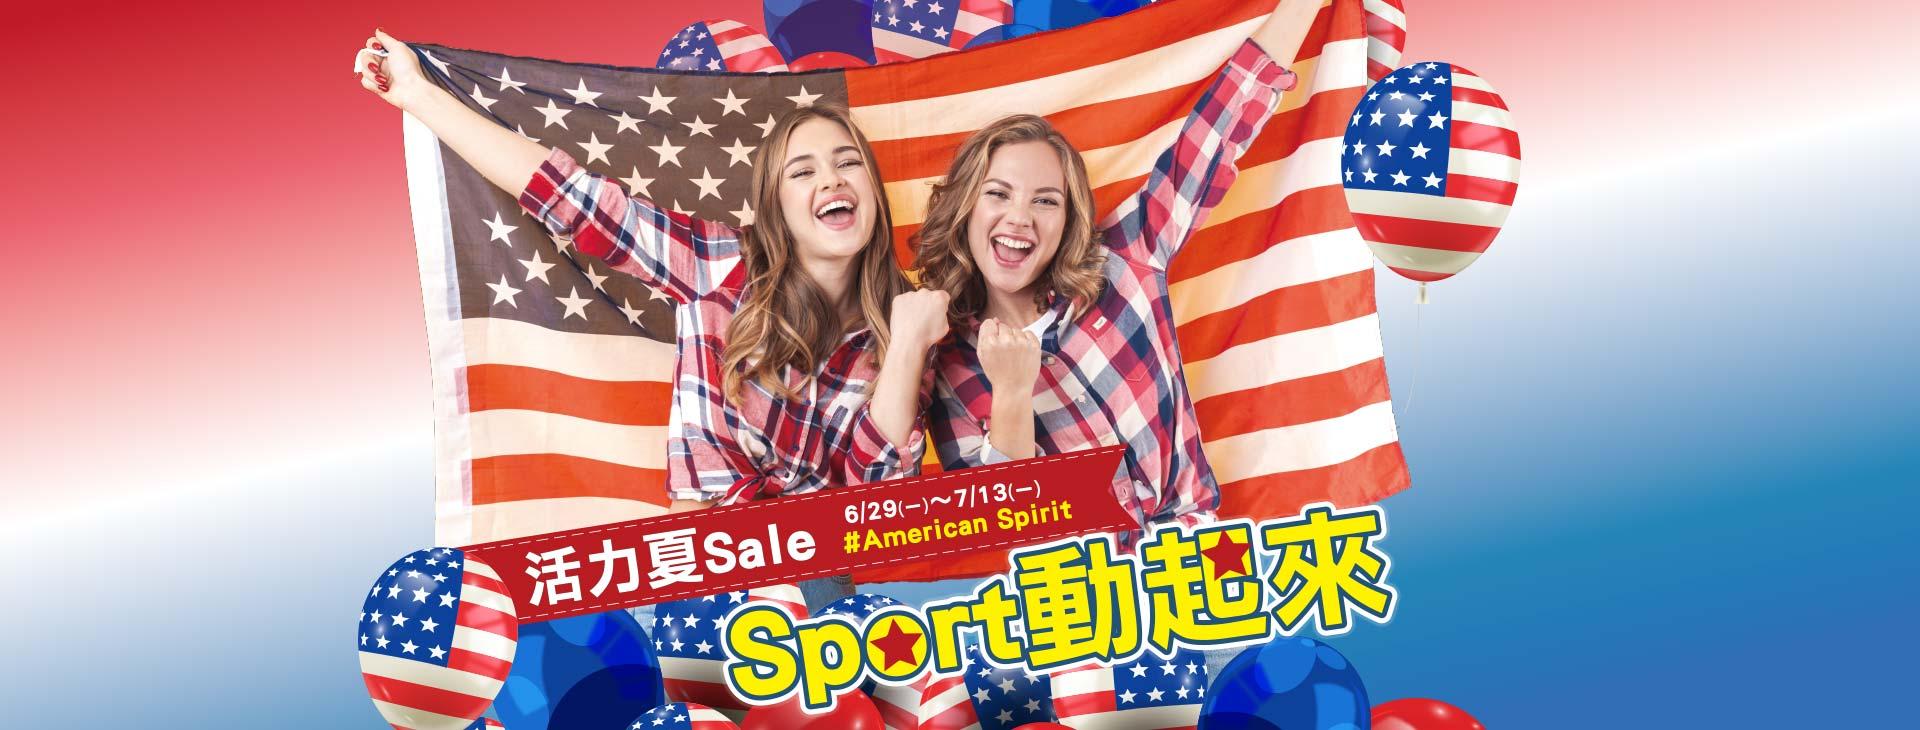 Sport動起來~活力夏SALE #American Spirit